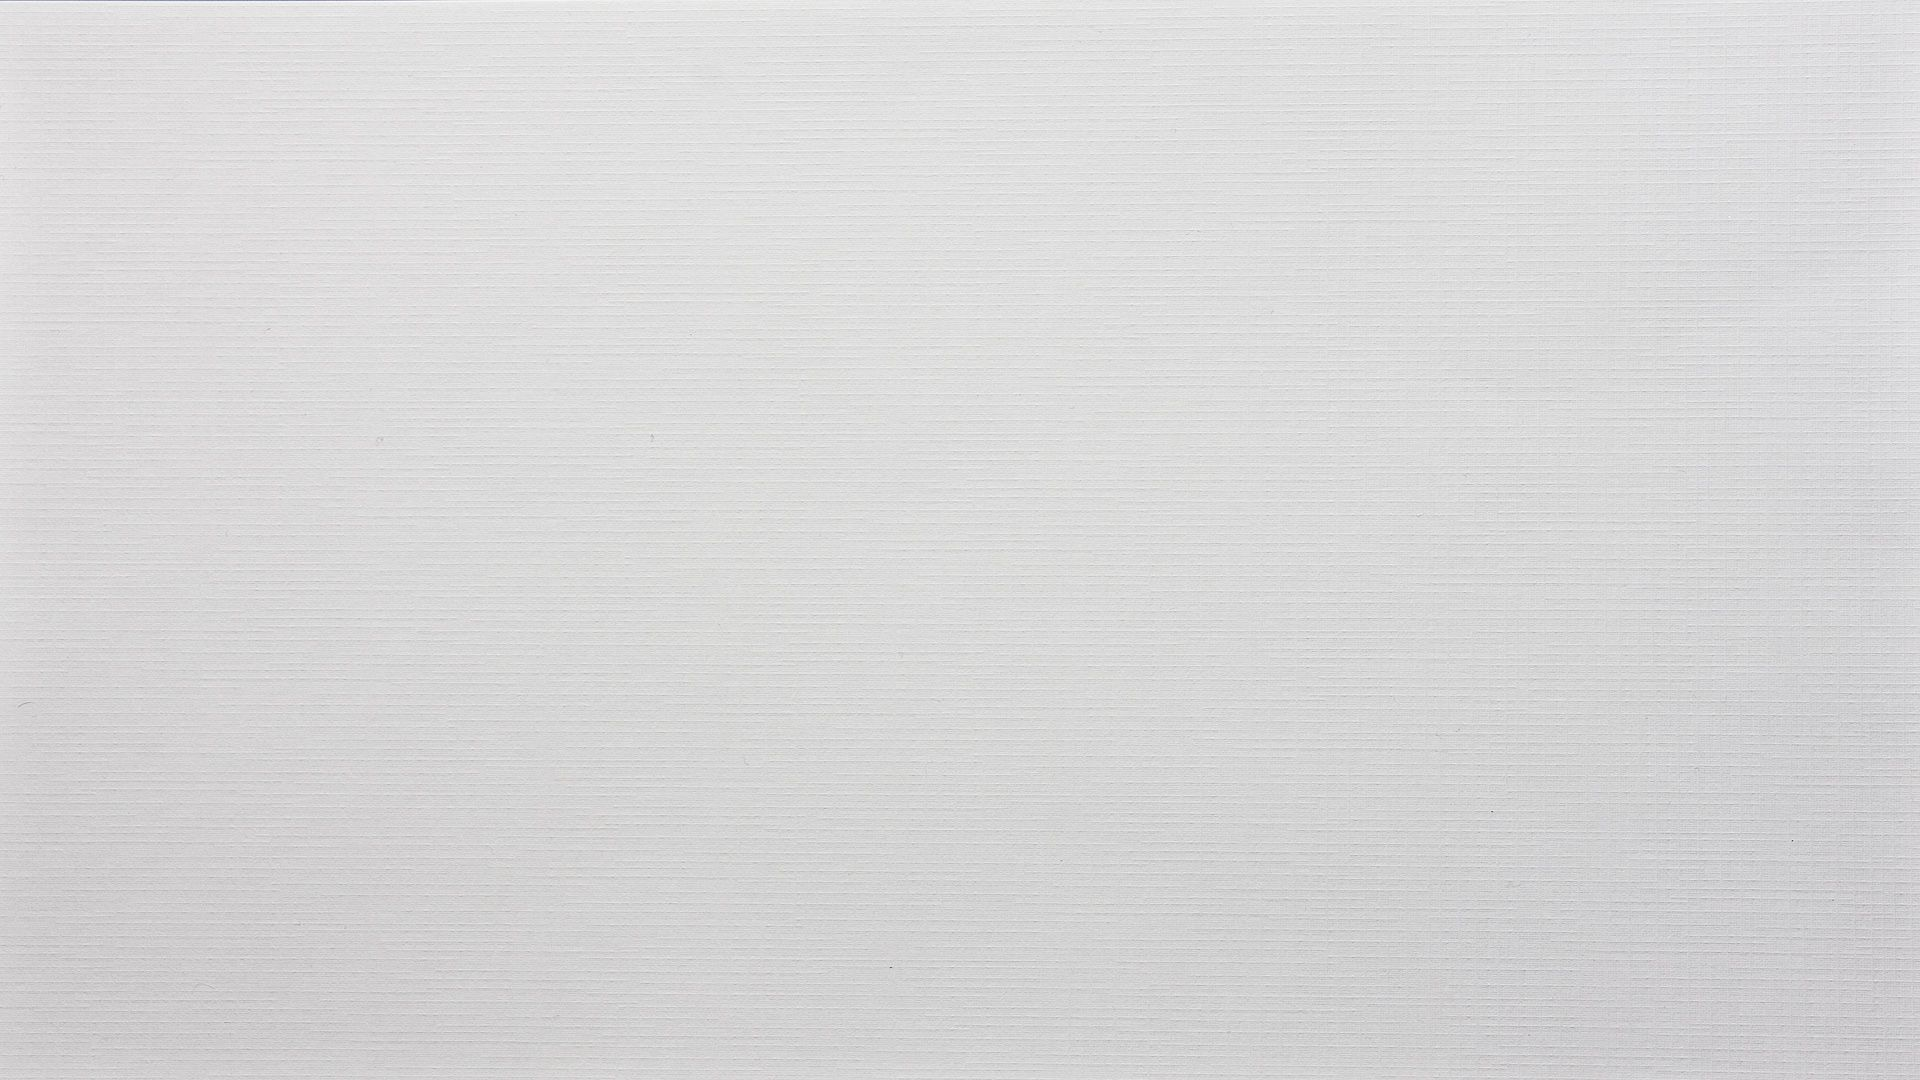 Photography Paper Desktop Wallpaper